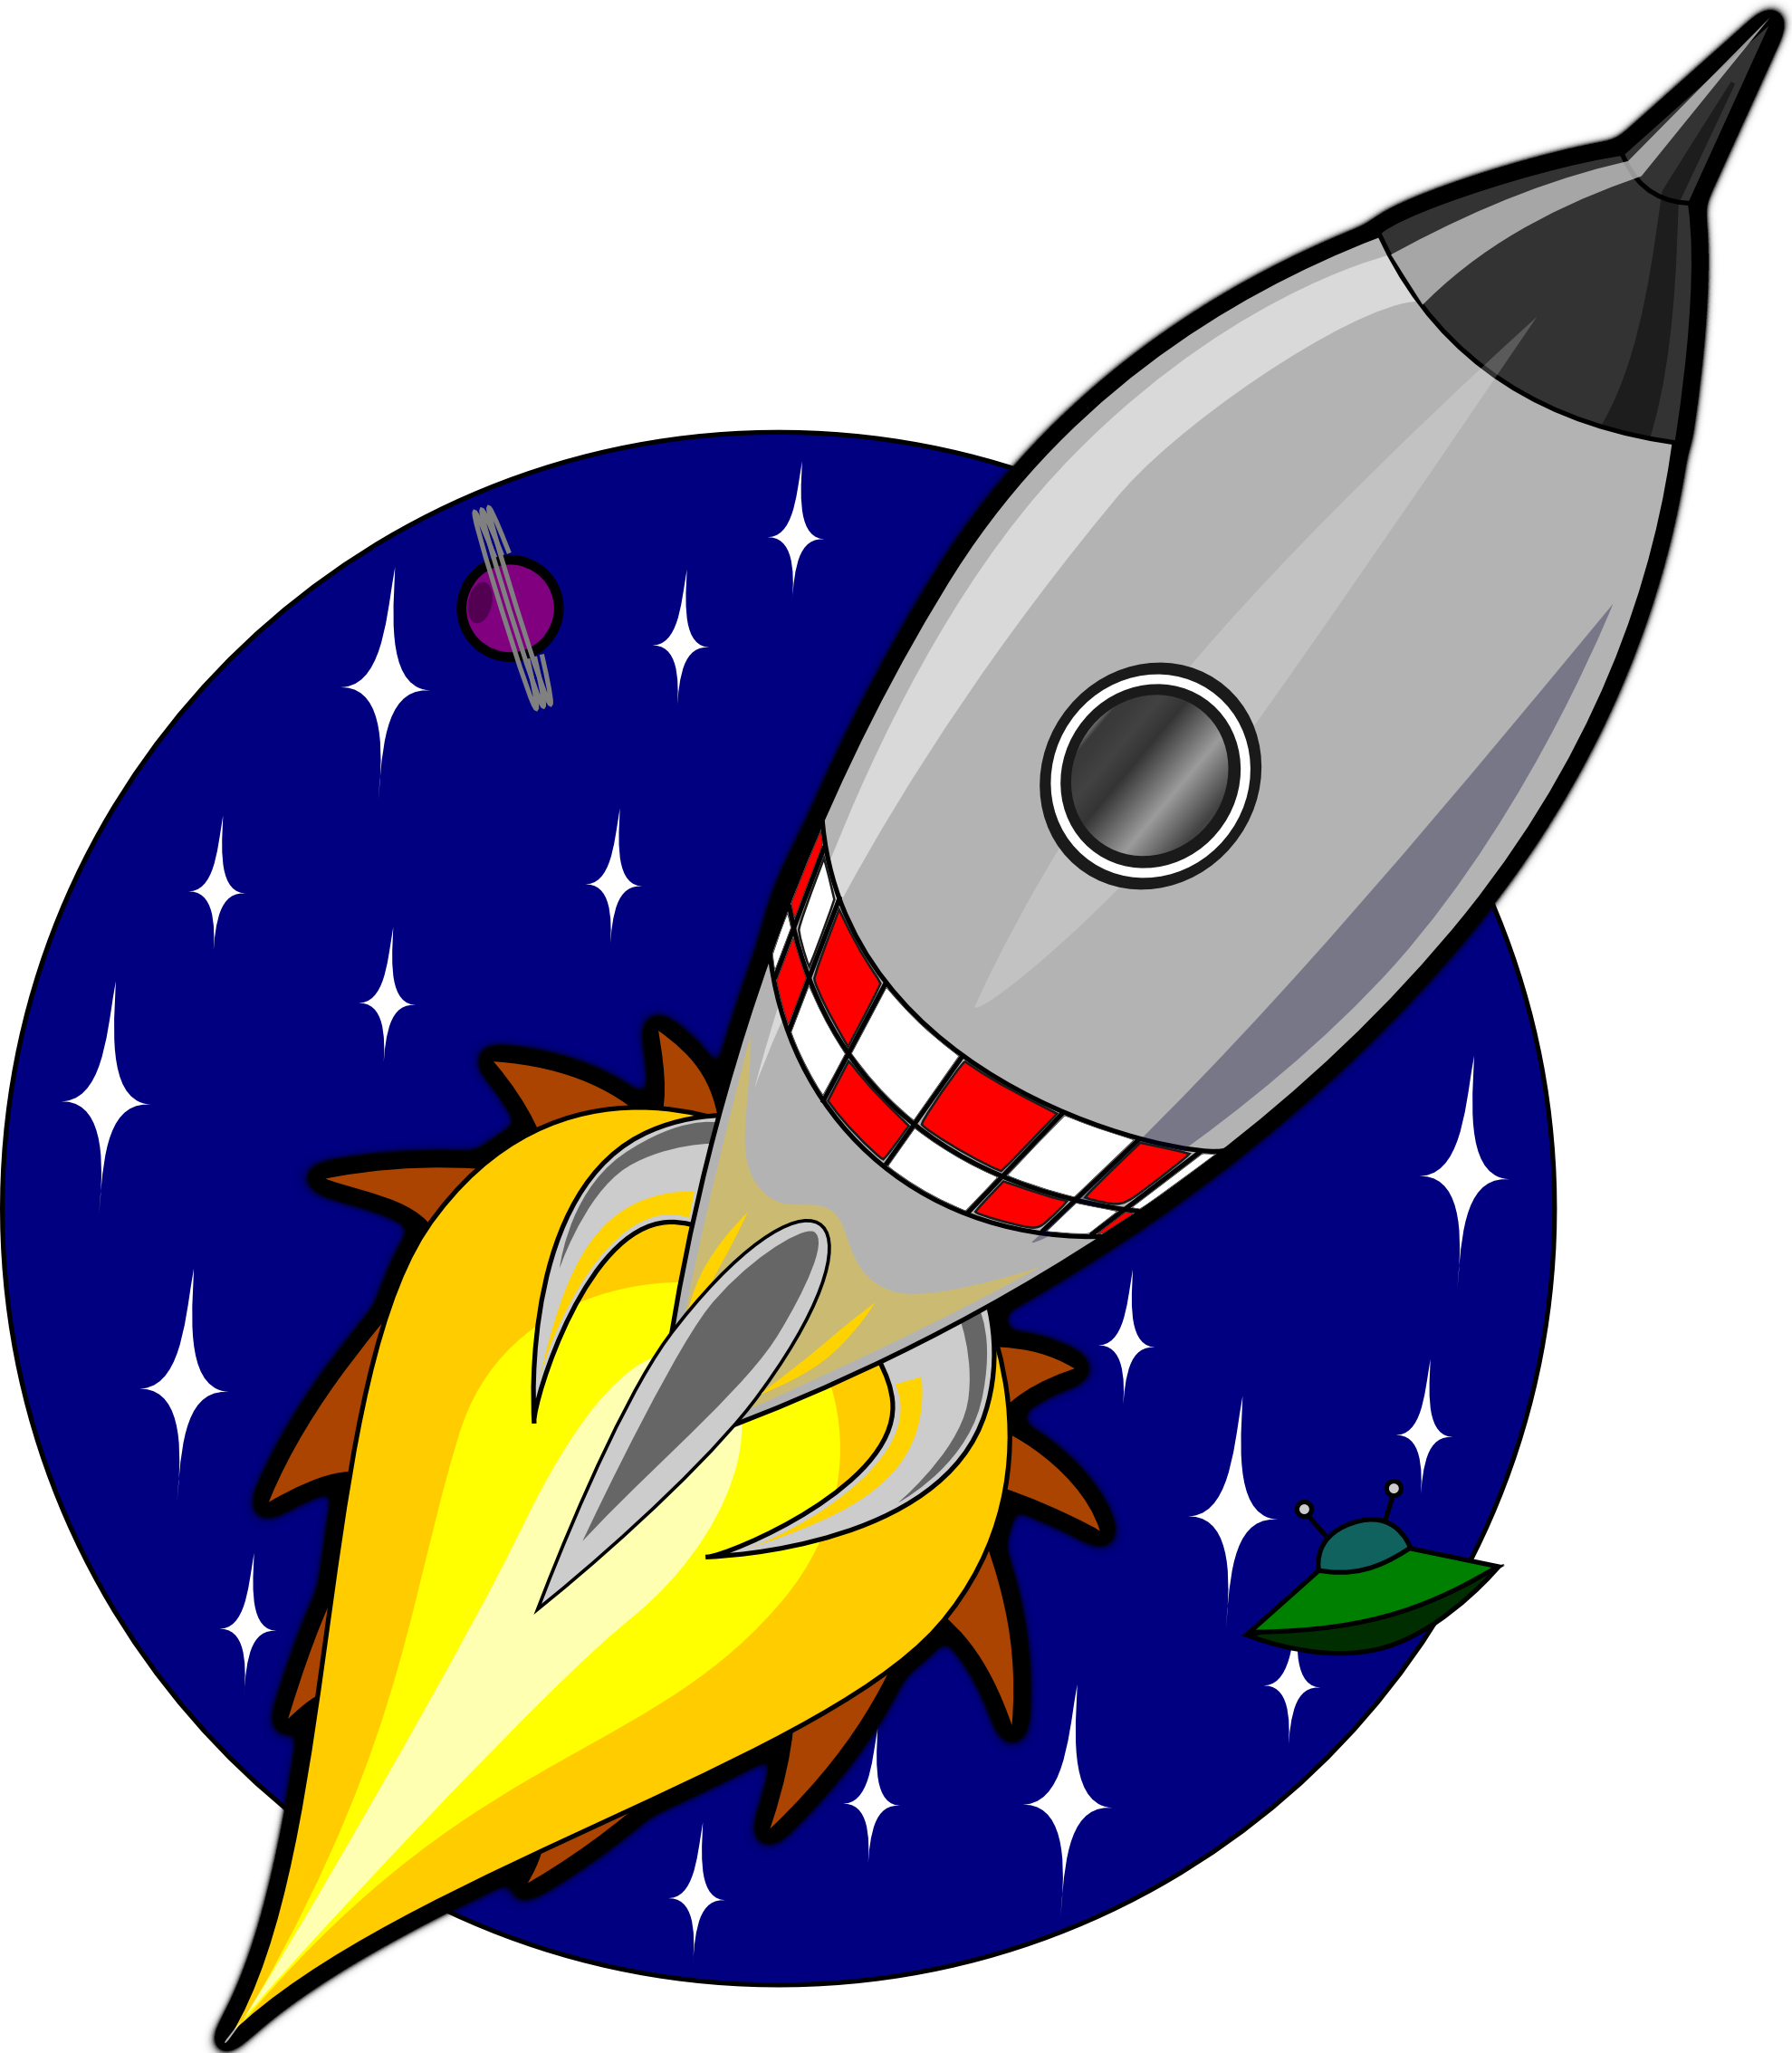 Clipart rocket rocket math. Clip art free images